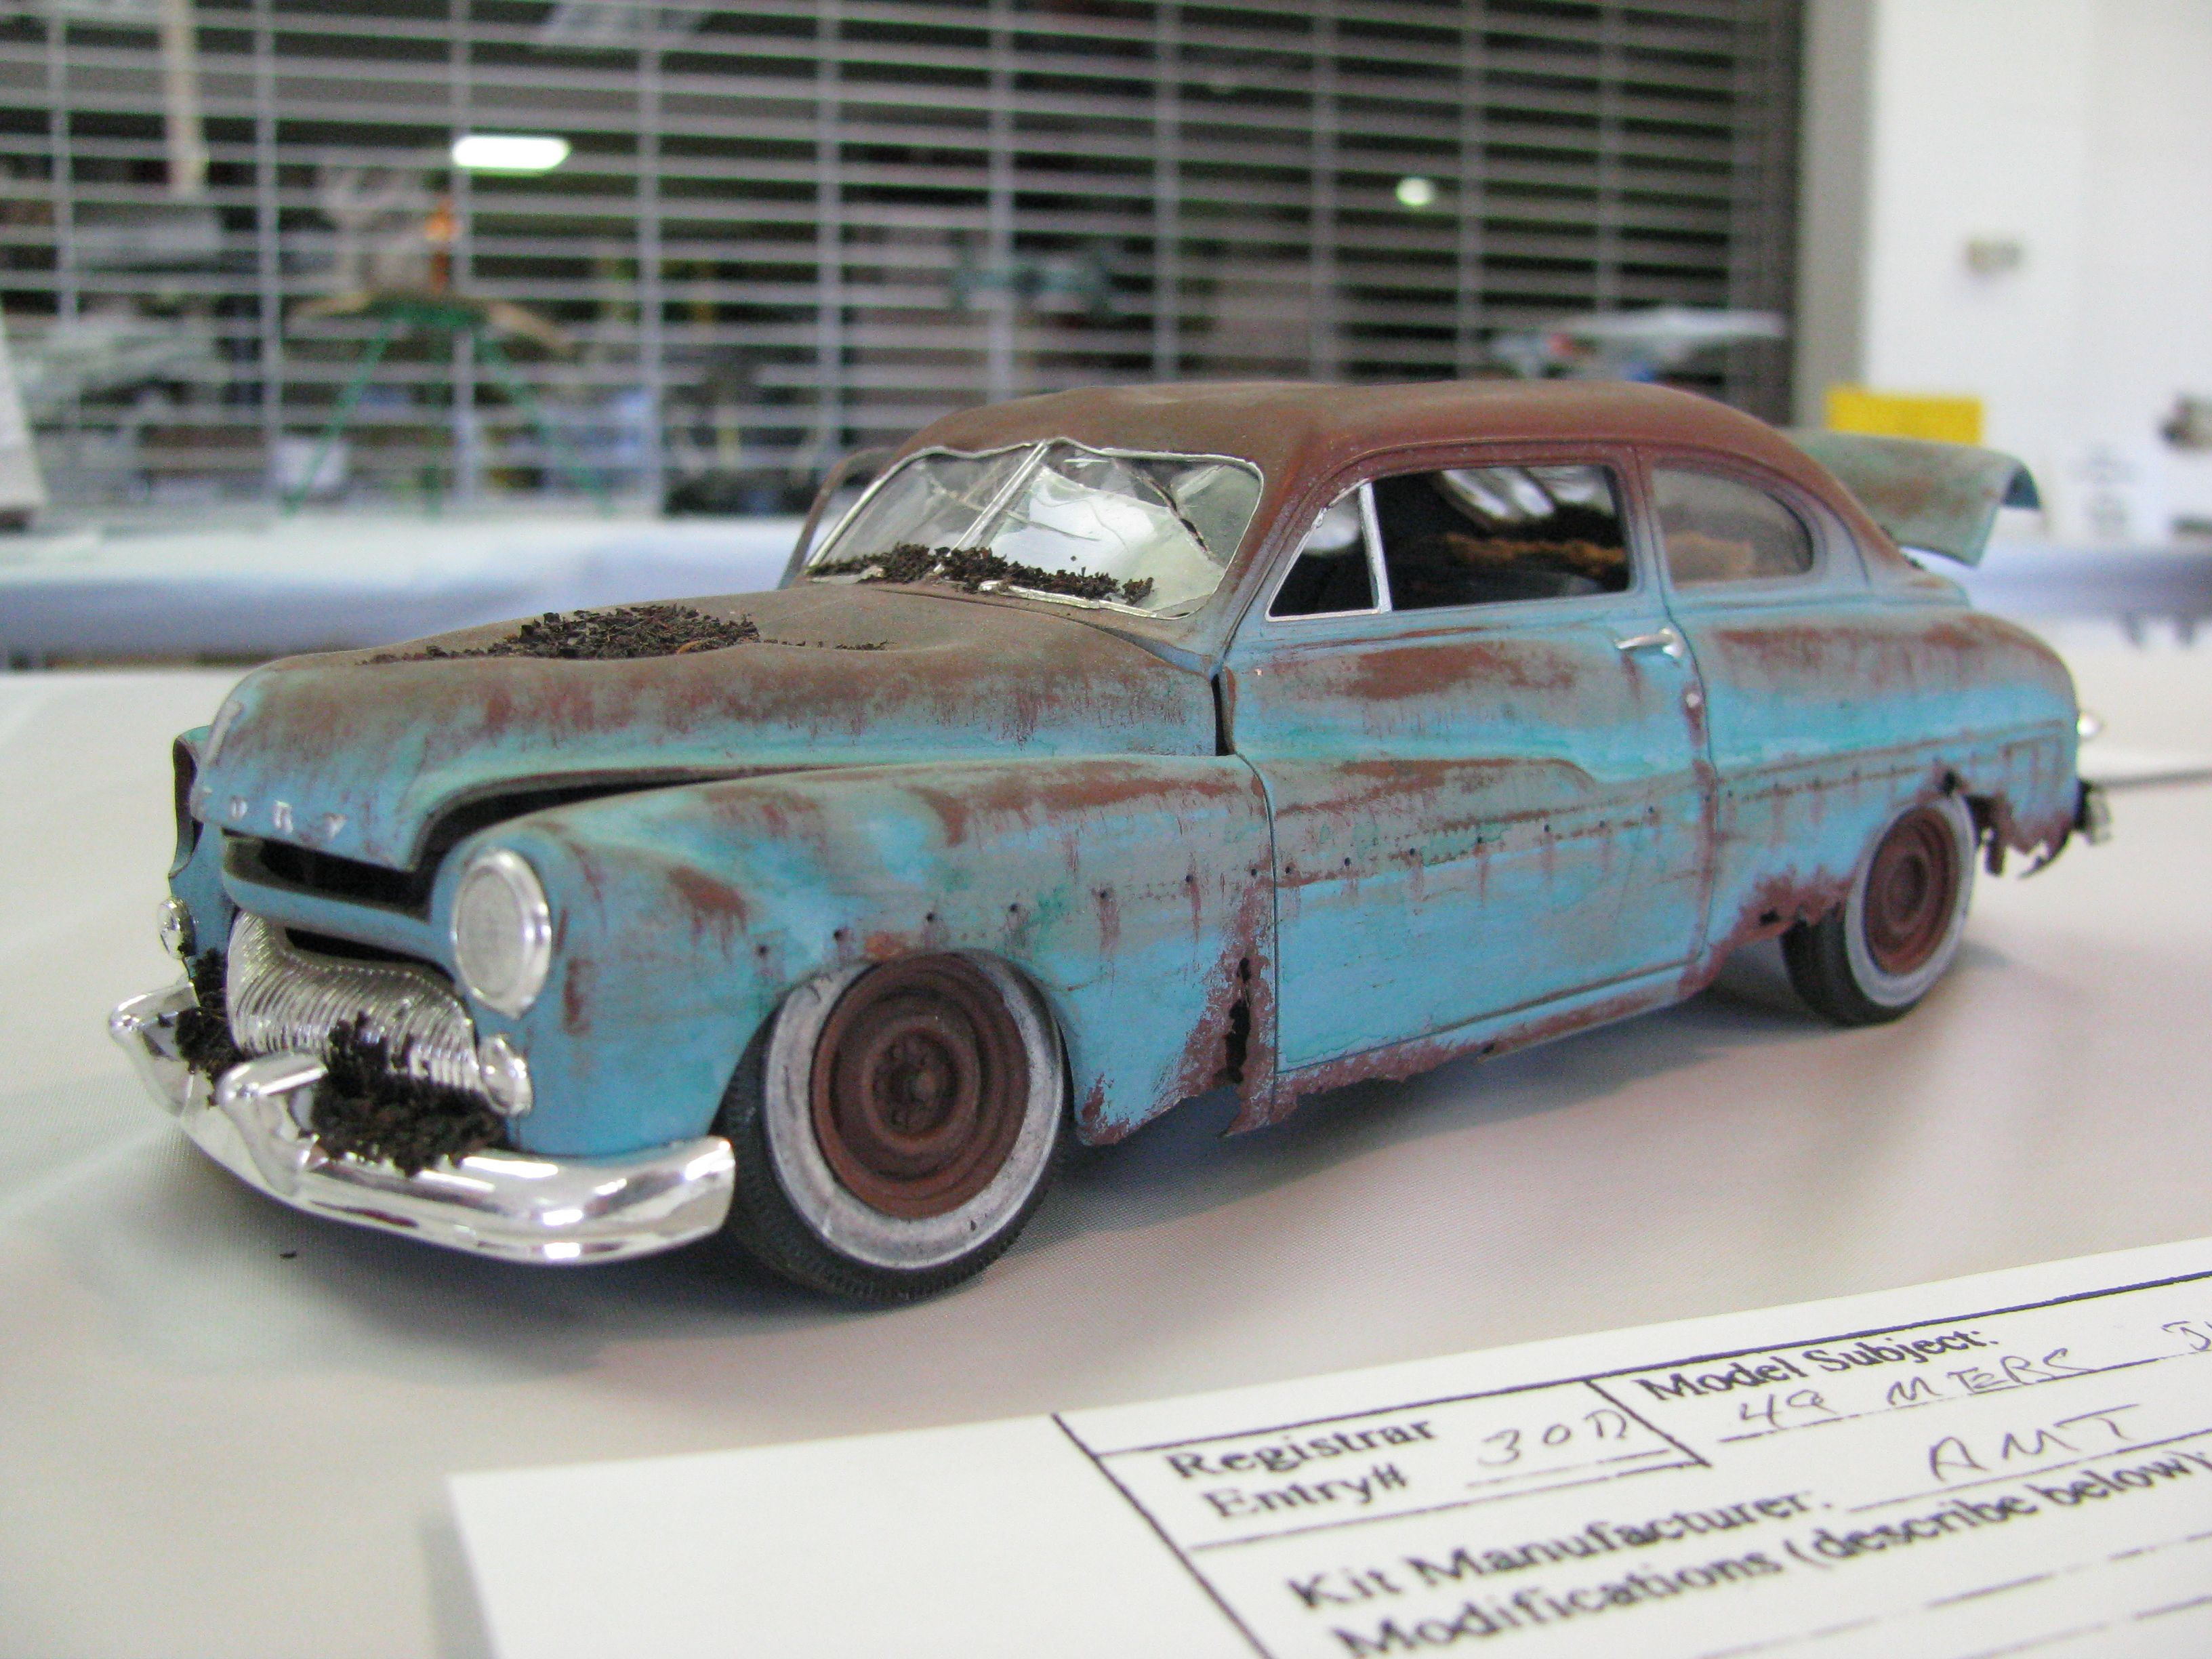 Pin by Paul Northrup on Model cars | Pinterest | 49 mercury, Model ...